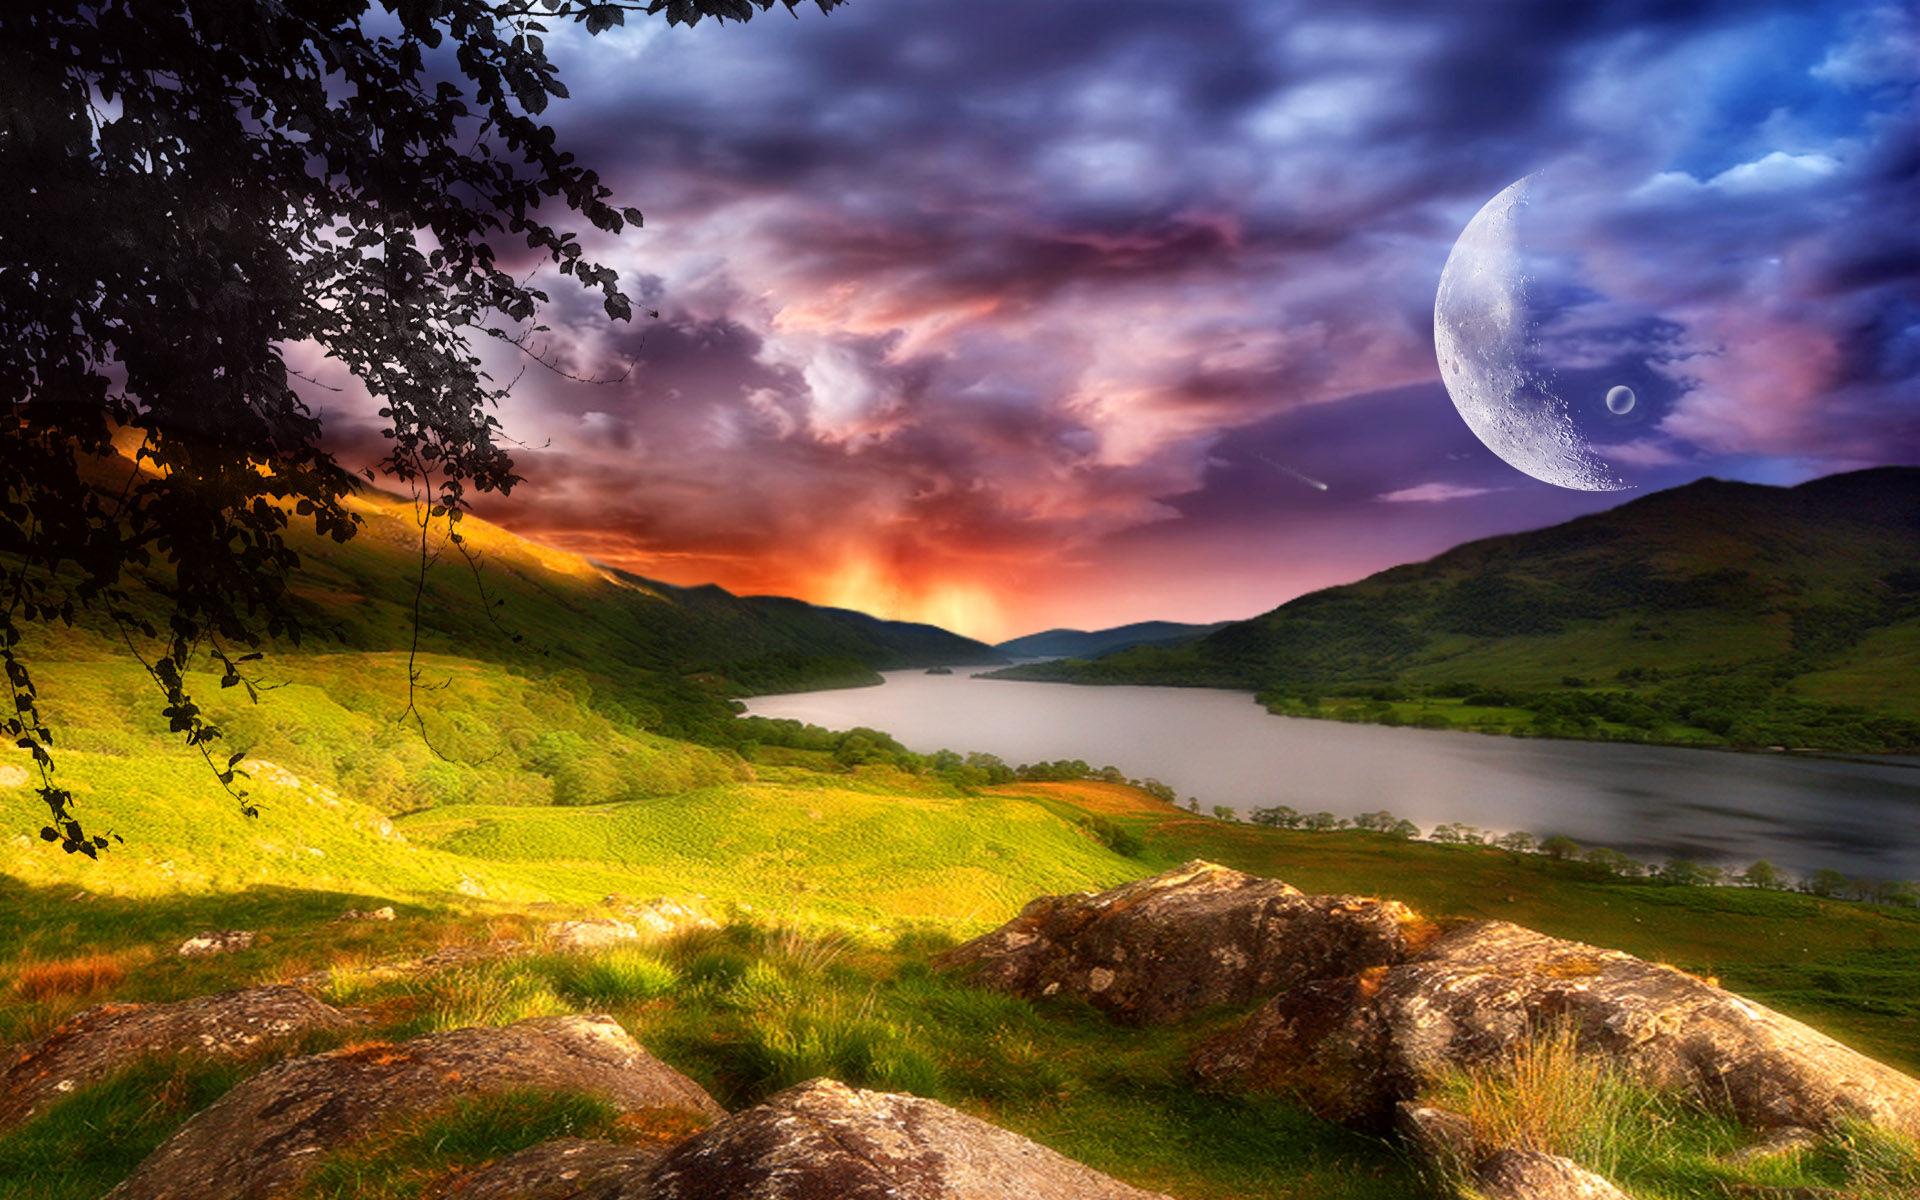 Landscape Background Wallpaper - WallpaperSafari